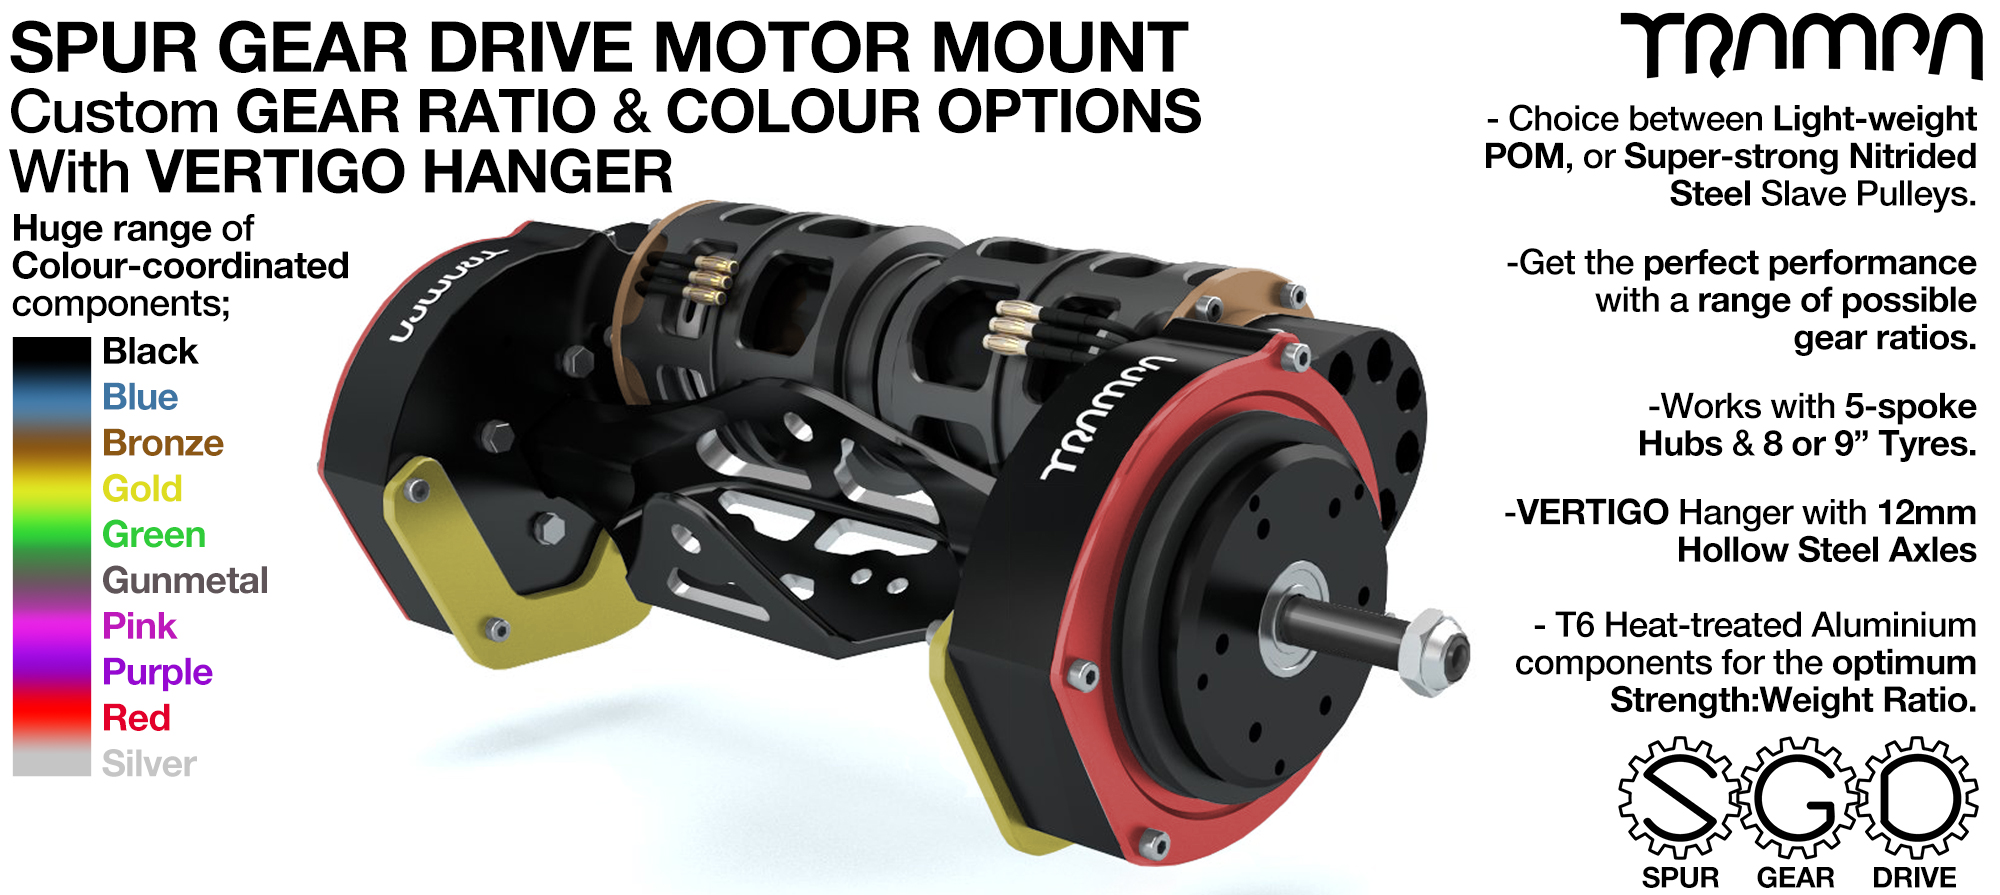 Mountainboard EXTERNAL Spur Gear Drive TWIN Motor Mounts with Motors & VERTIGO Hanger